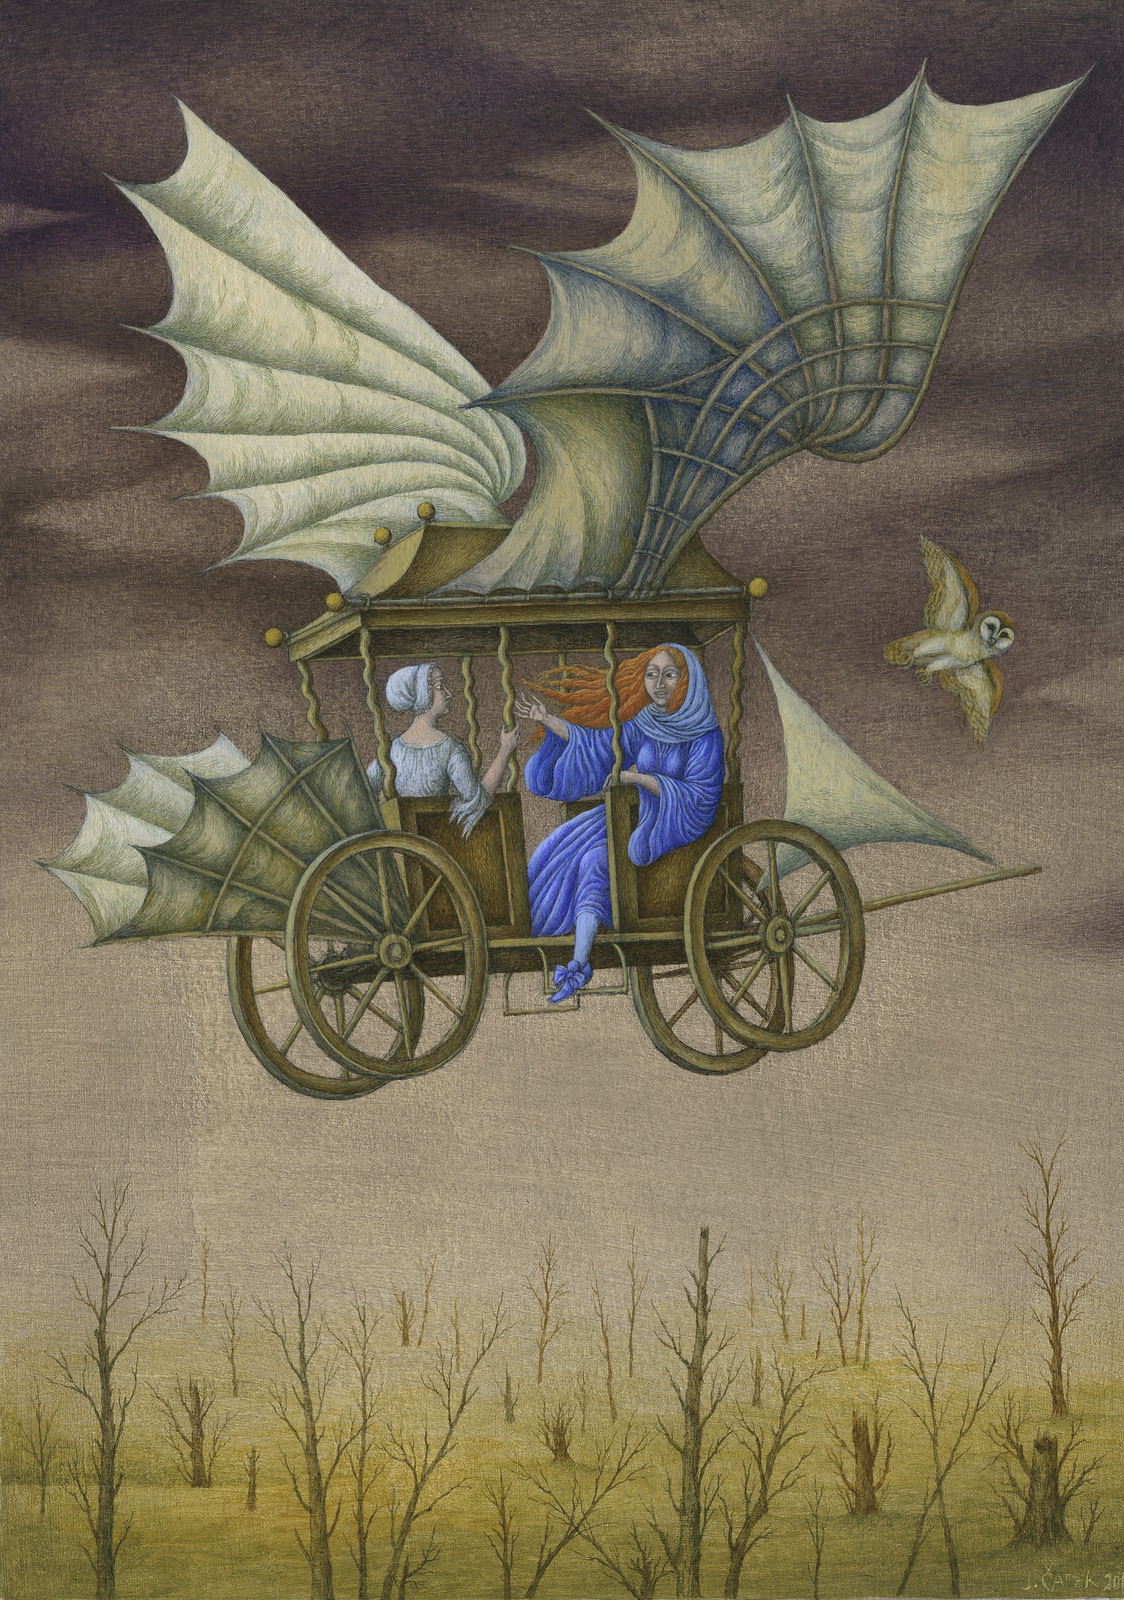 Jindra Capek - The Kingdom of Mighty Villas, Illustration 1